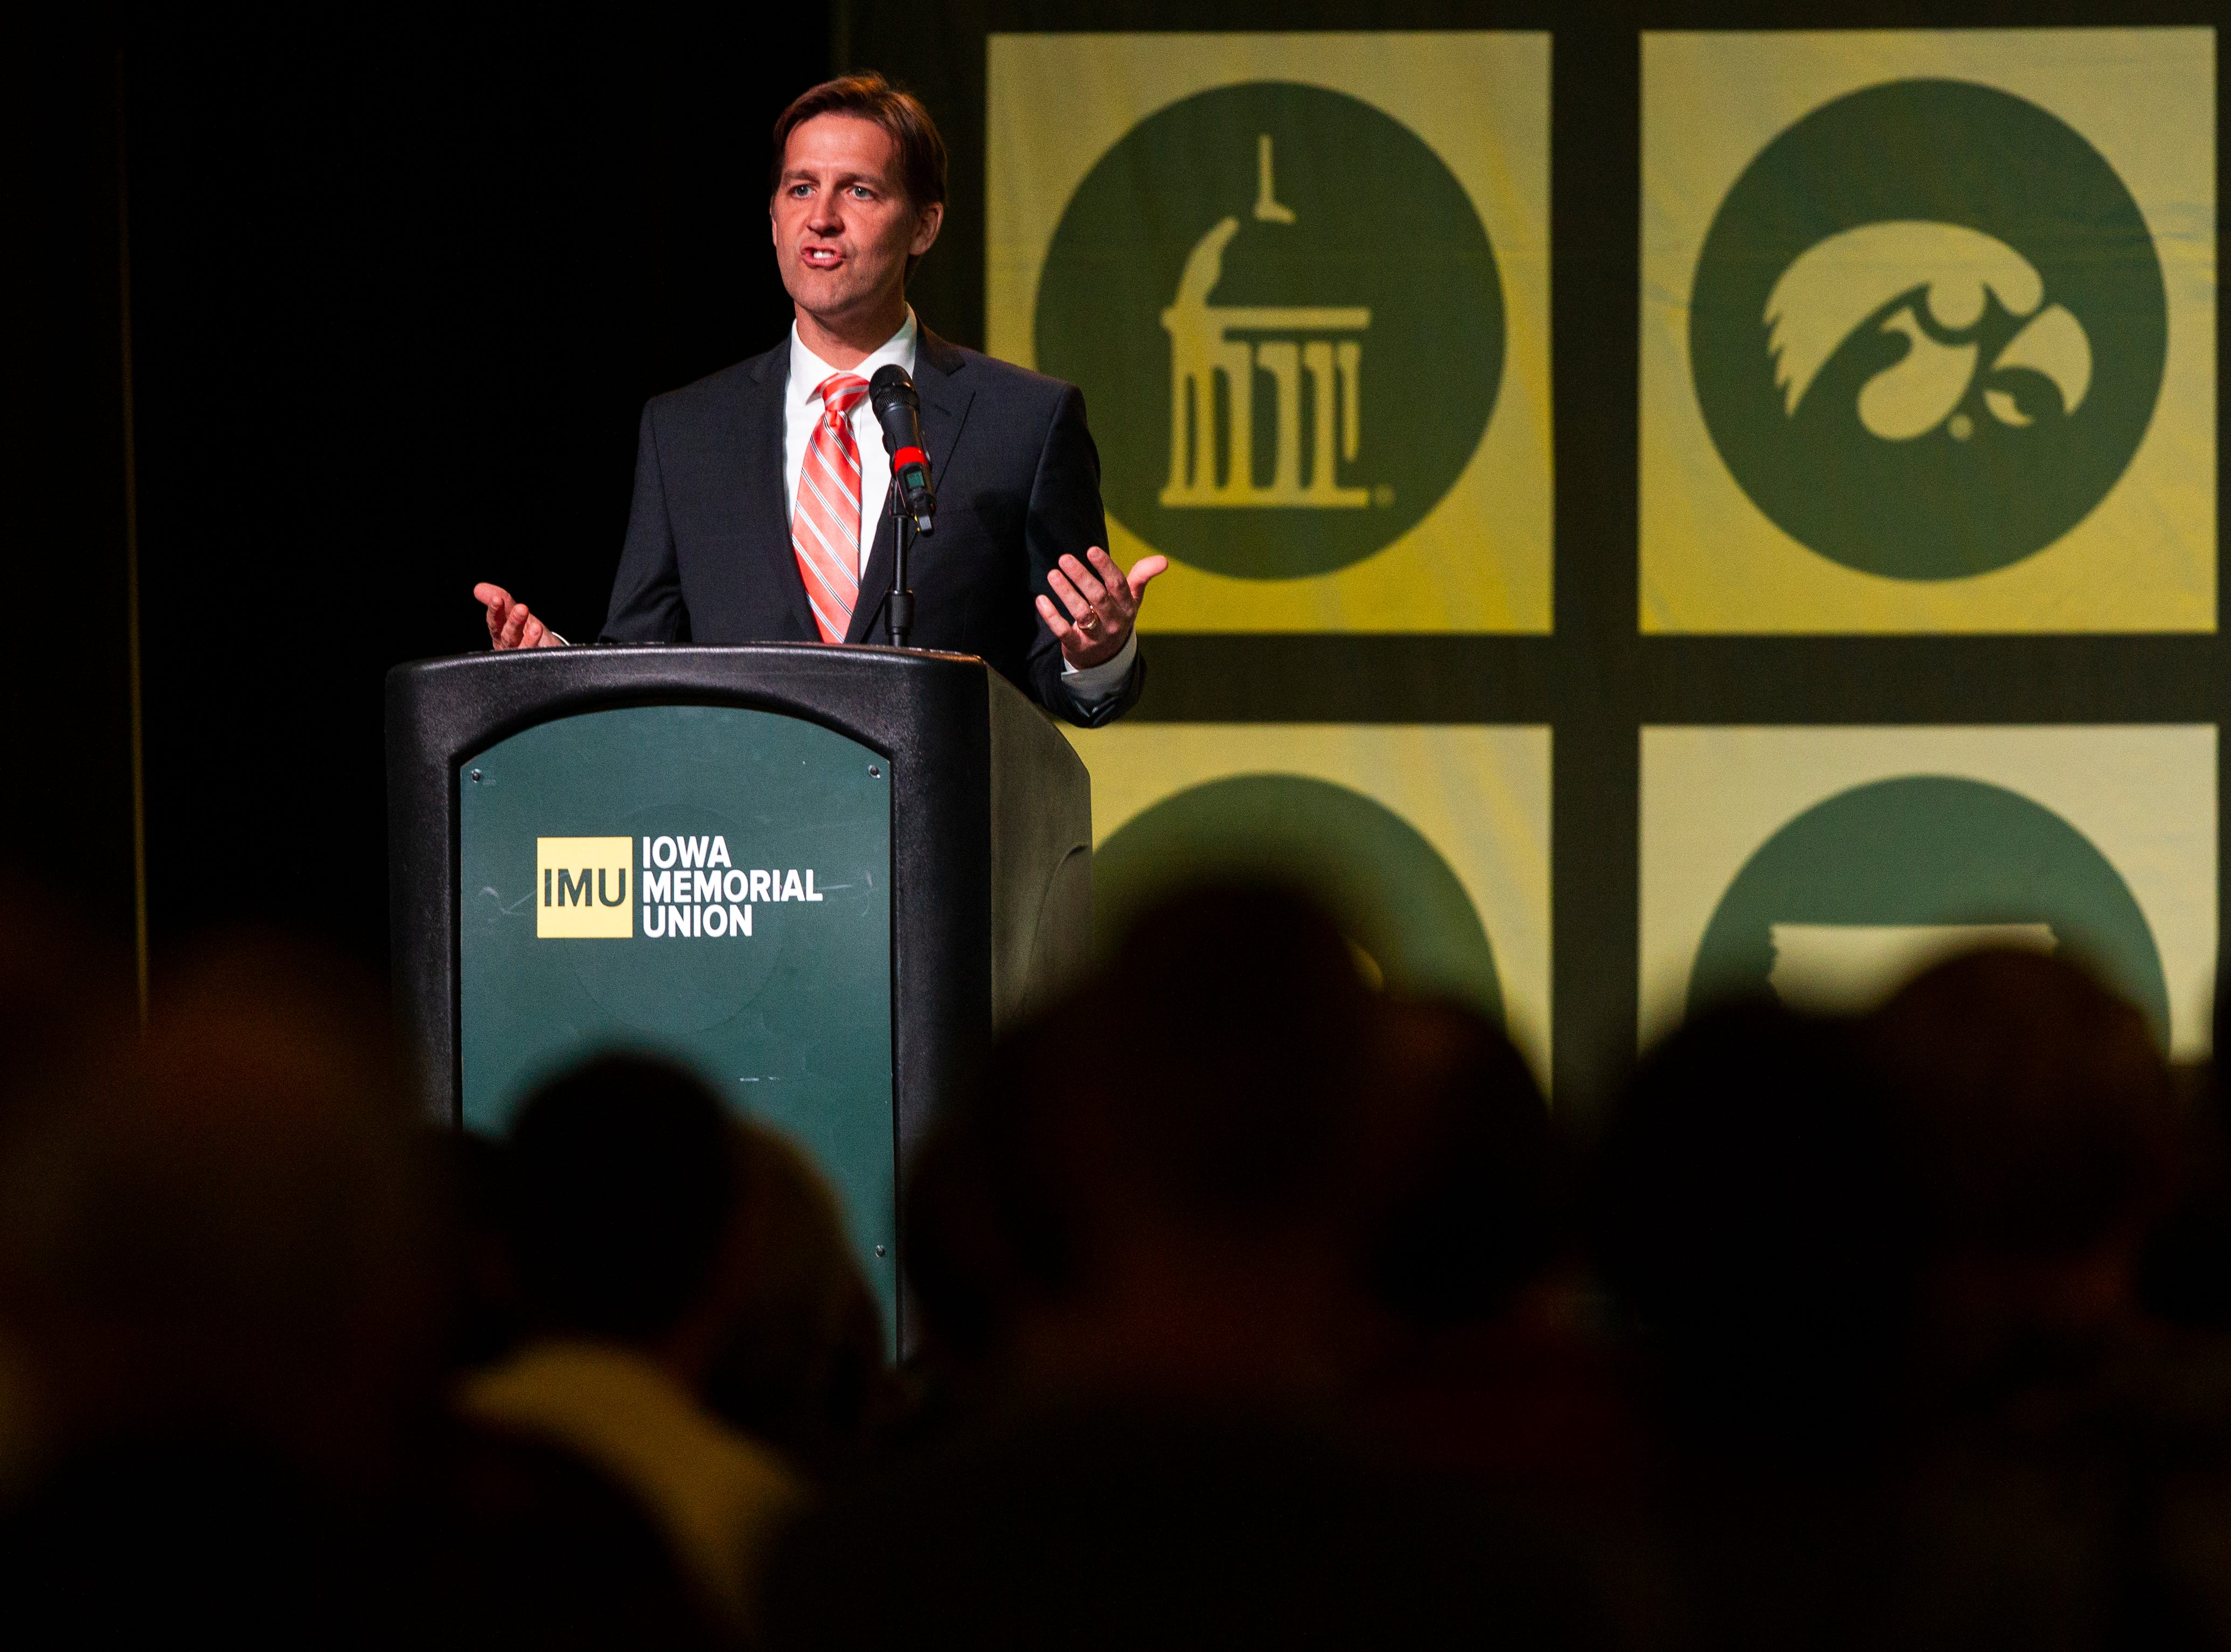 U.S. Sen. Ben Sasse, R-Nebraska, speaks on Thursday, Oct. 25, 2018, at the Iowa Memorial Union on the University of Iowa campus in Iowa City.